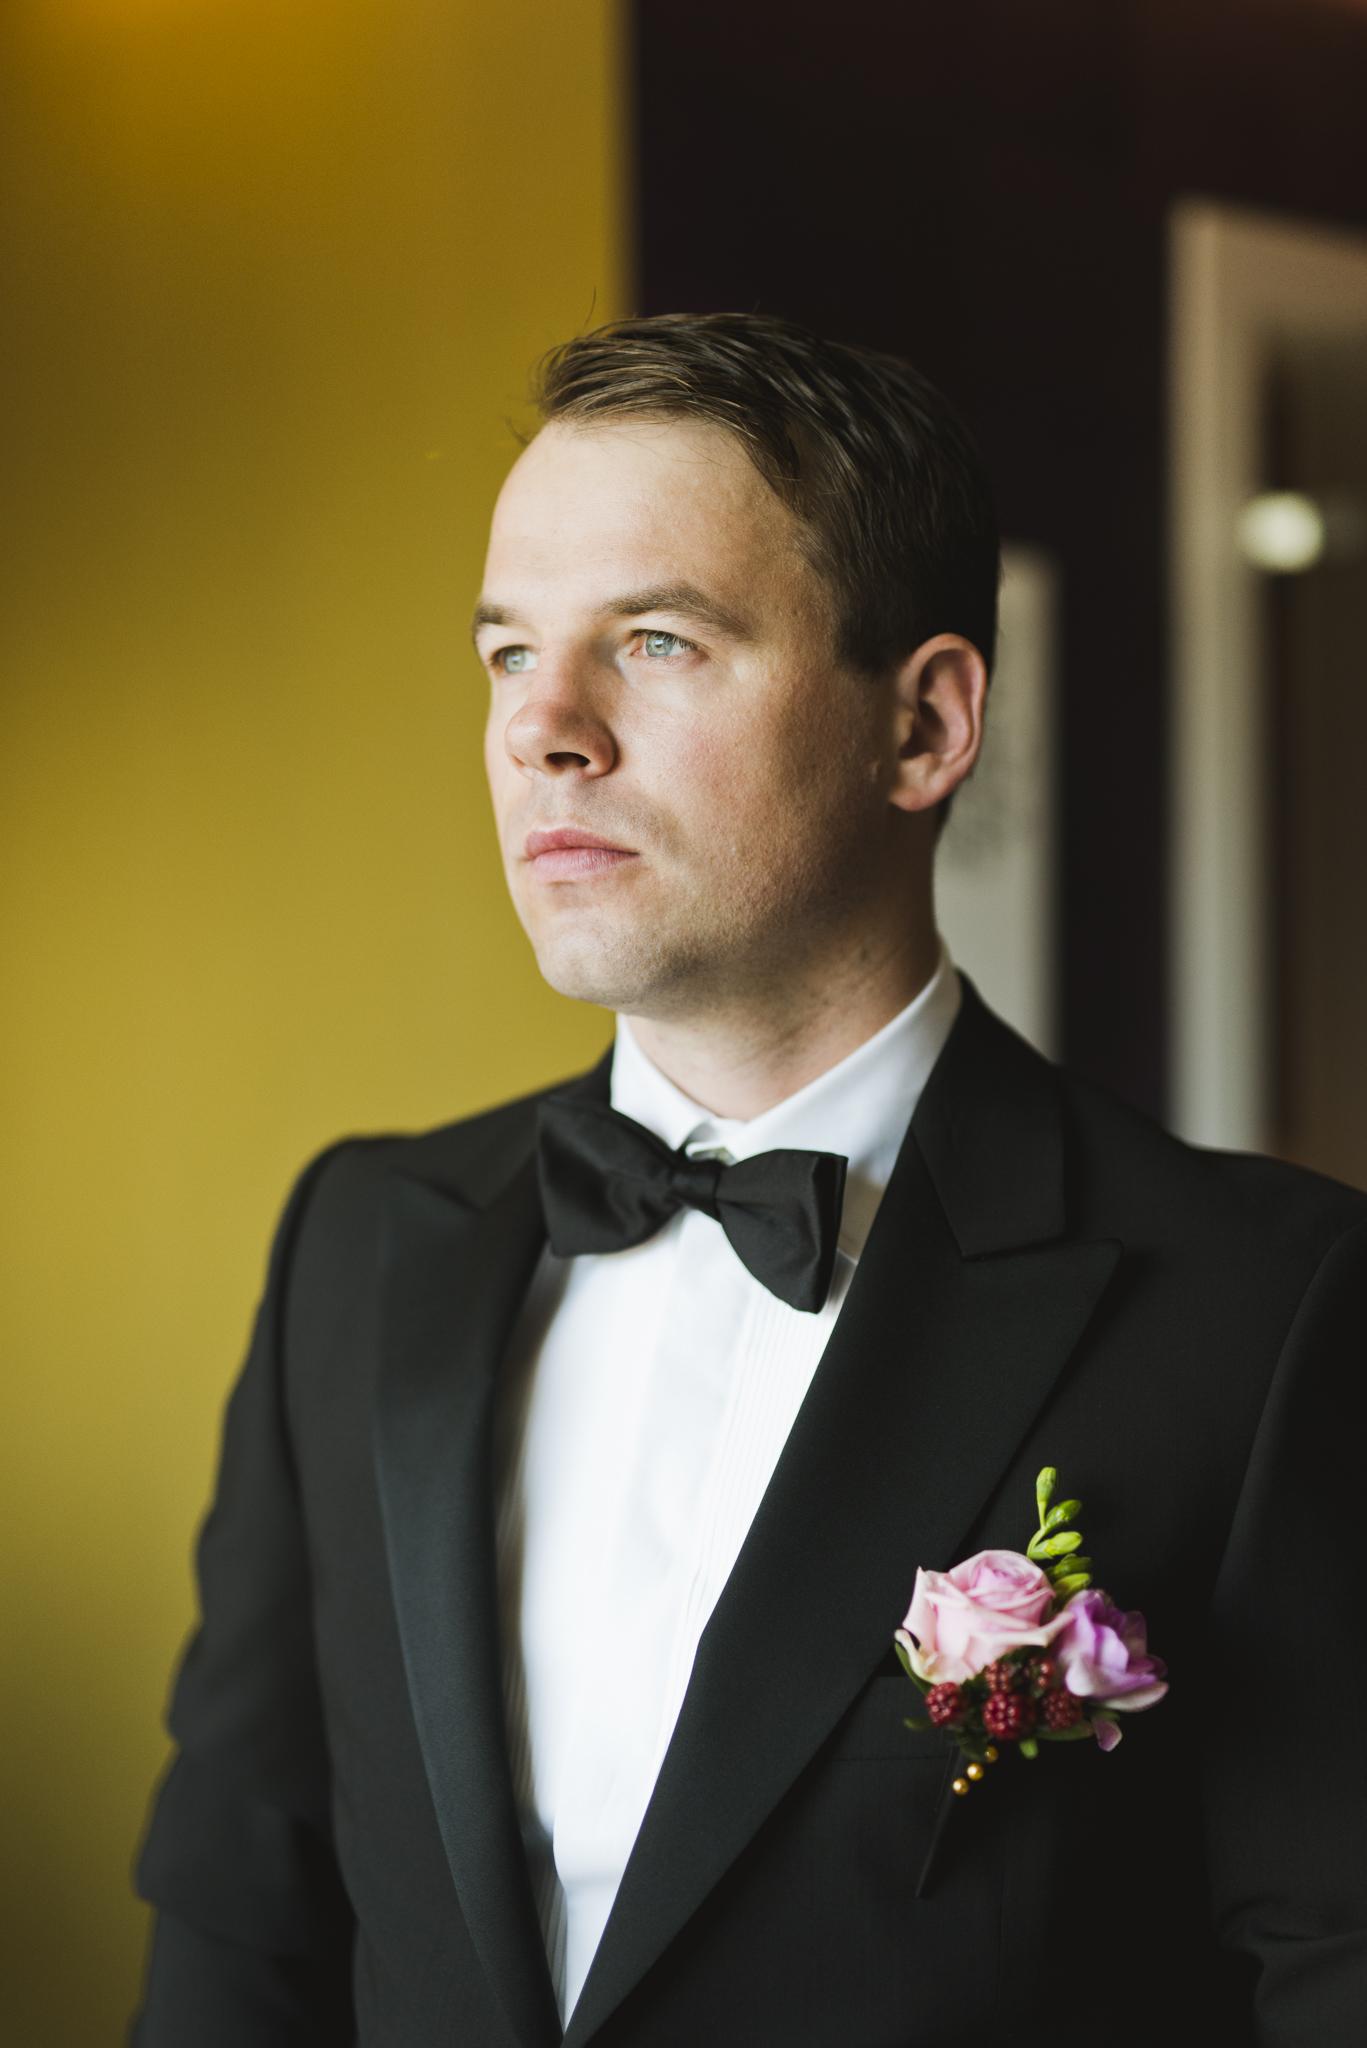 Bryllupsfotografering - Gitte